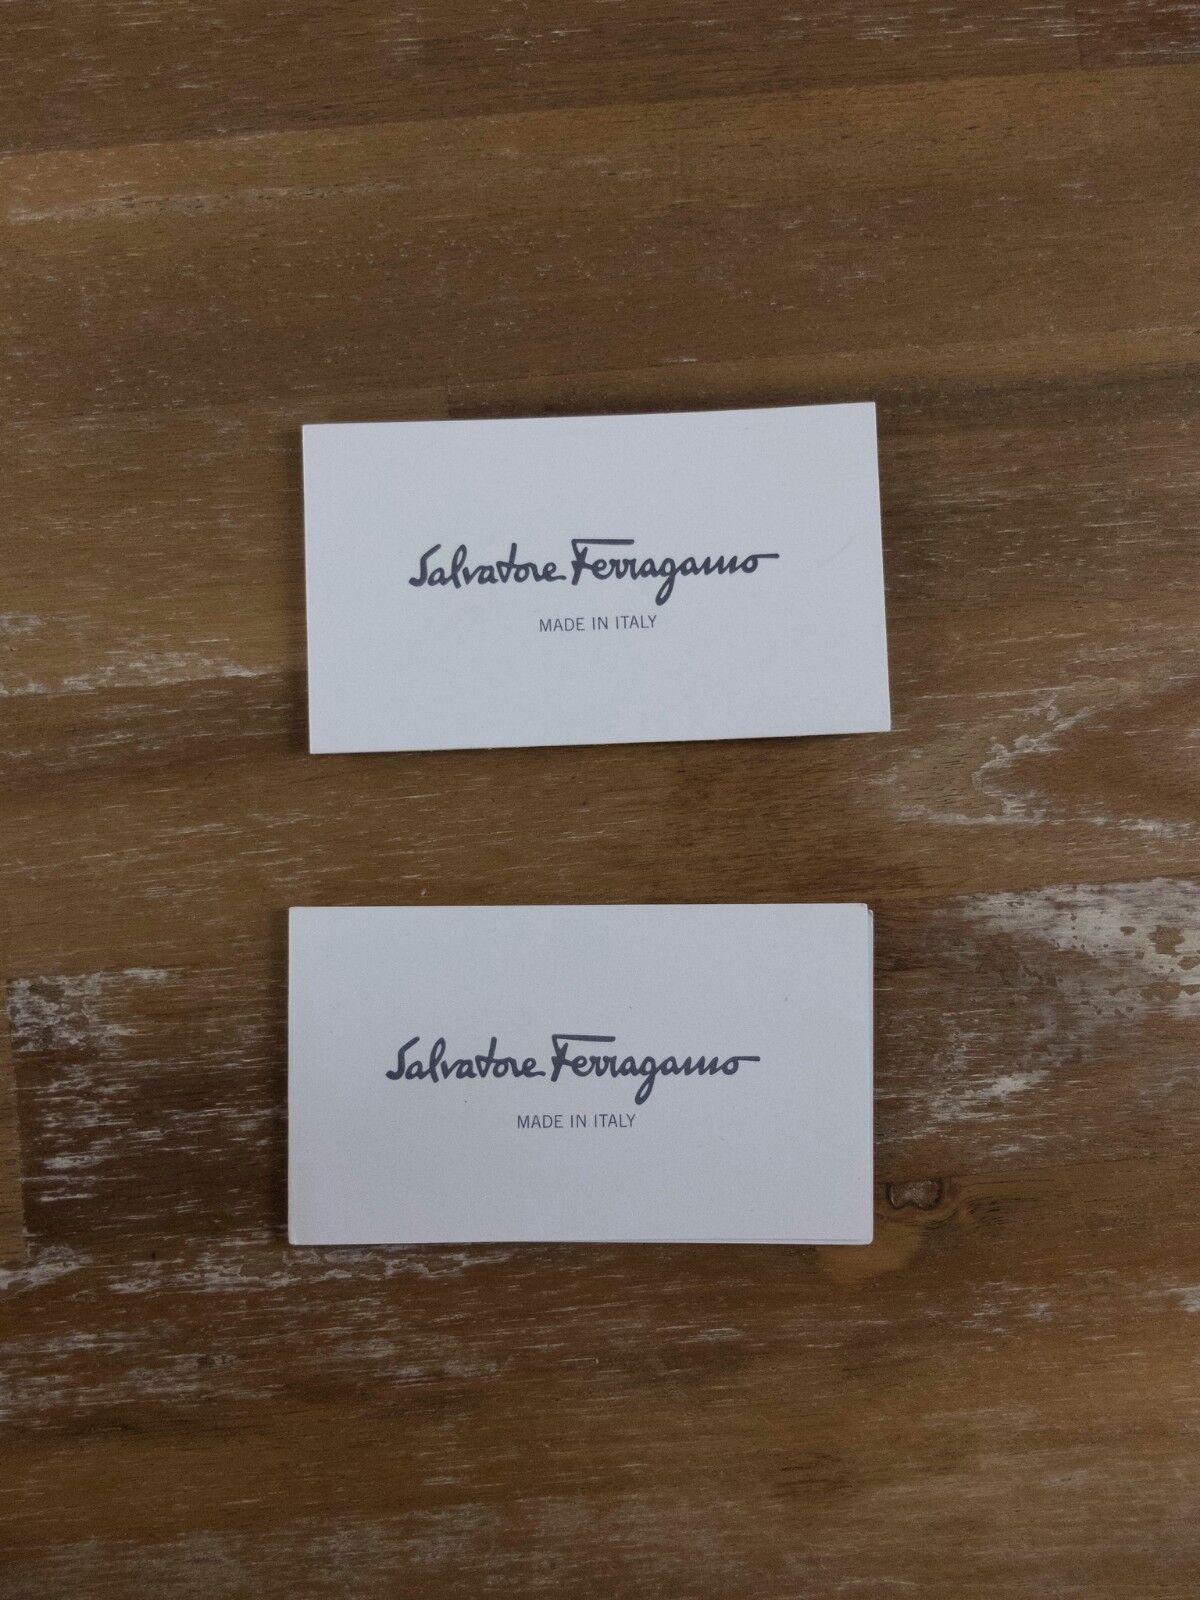 SALVATORE FERRAGAMO Madea leather platform sandals Size UK 10 US / 7.5 UK Size / 40.5 EU 3561d6